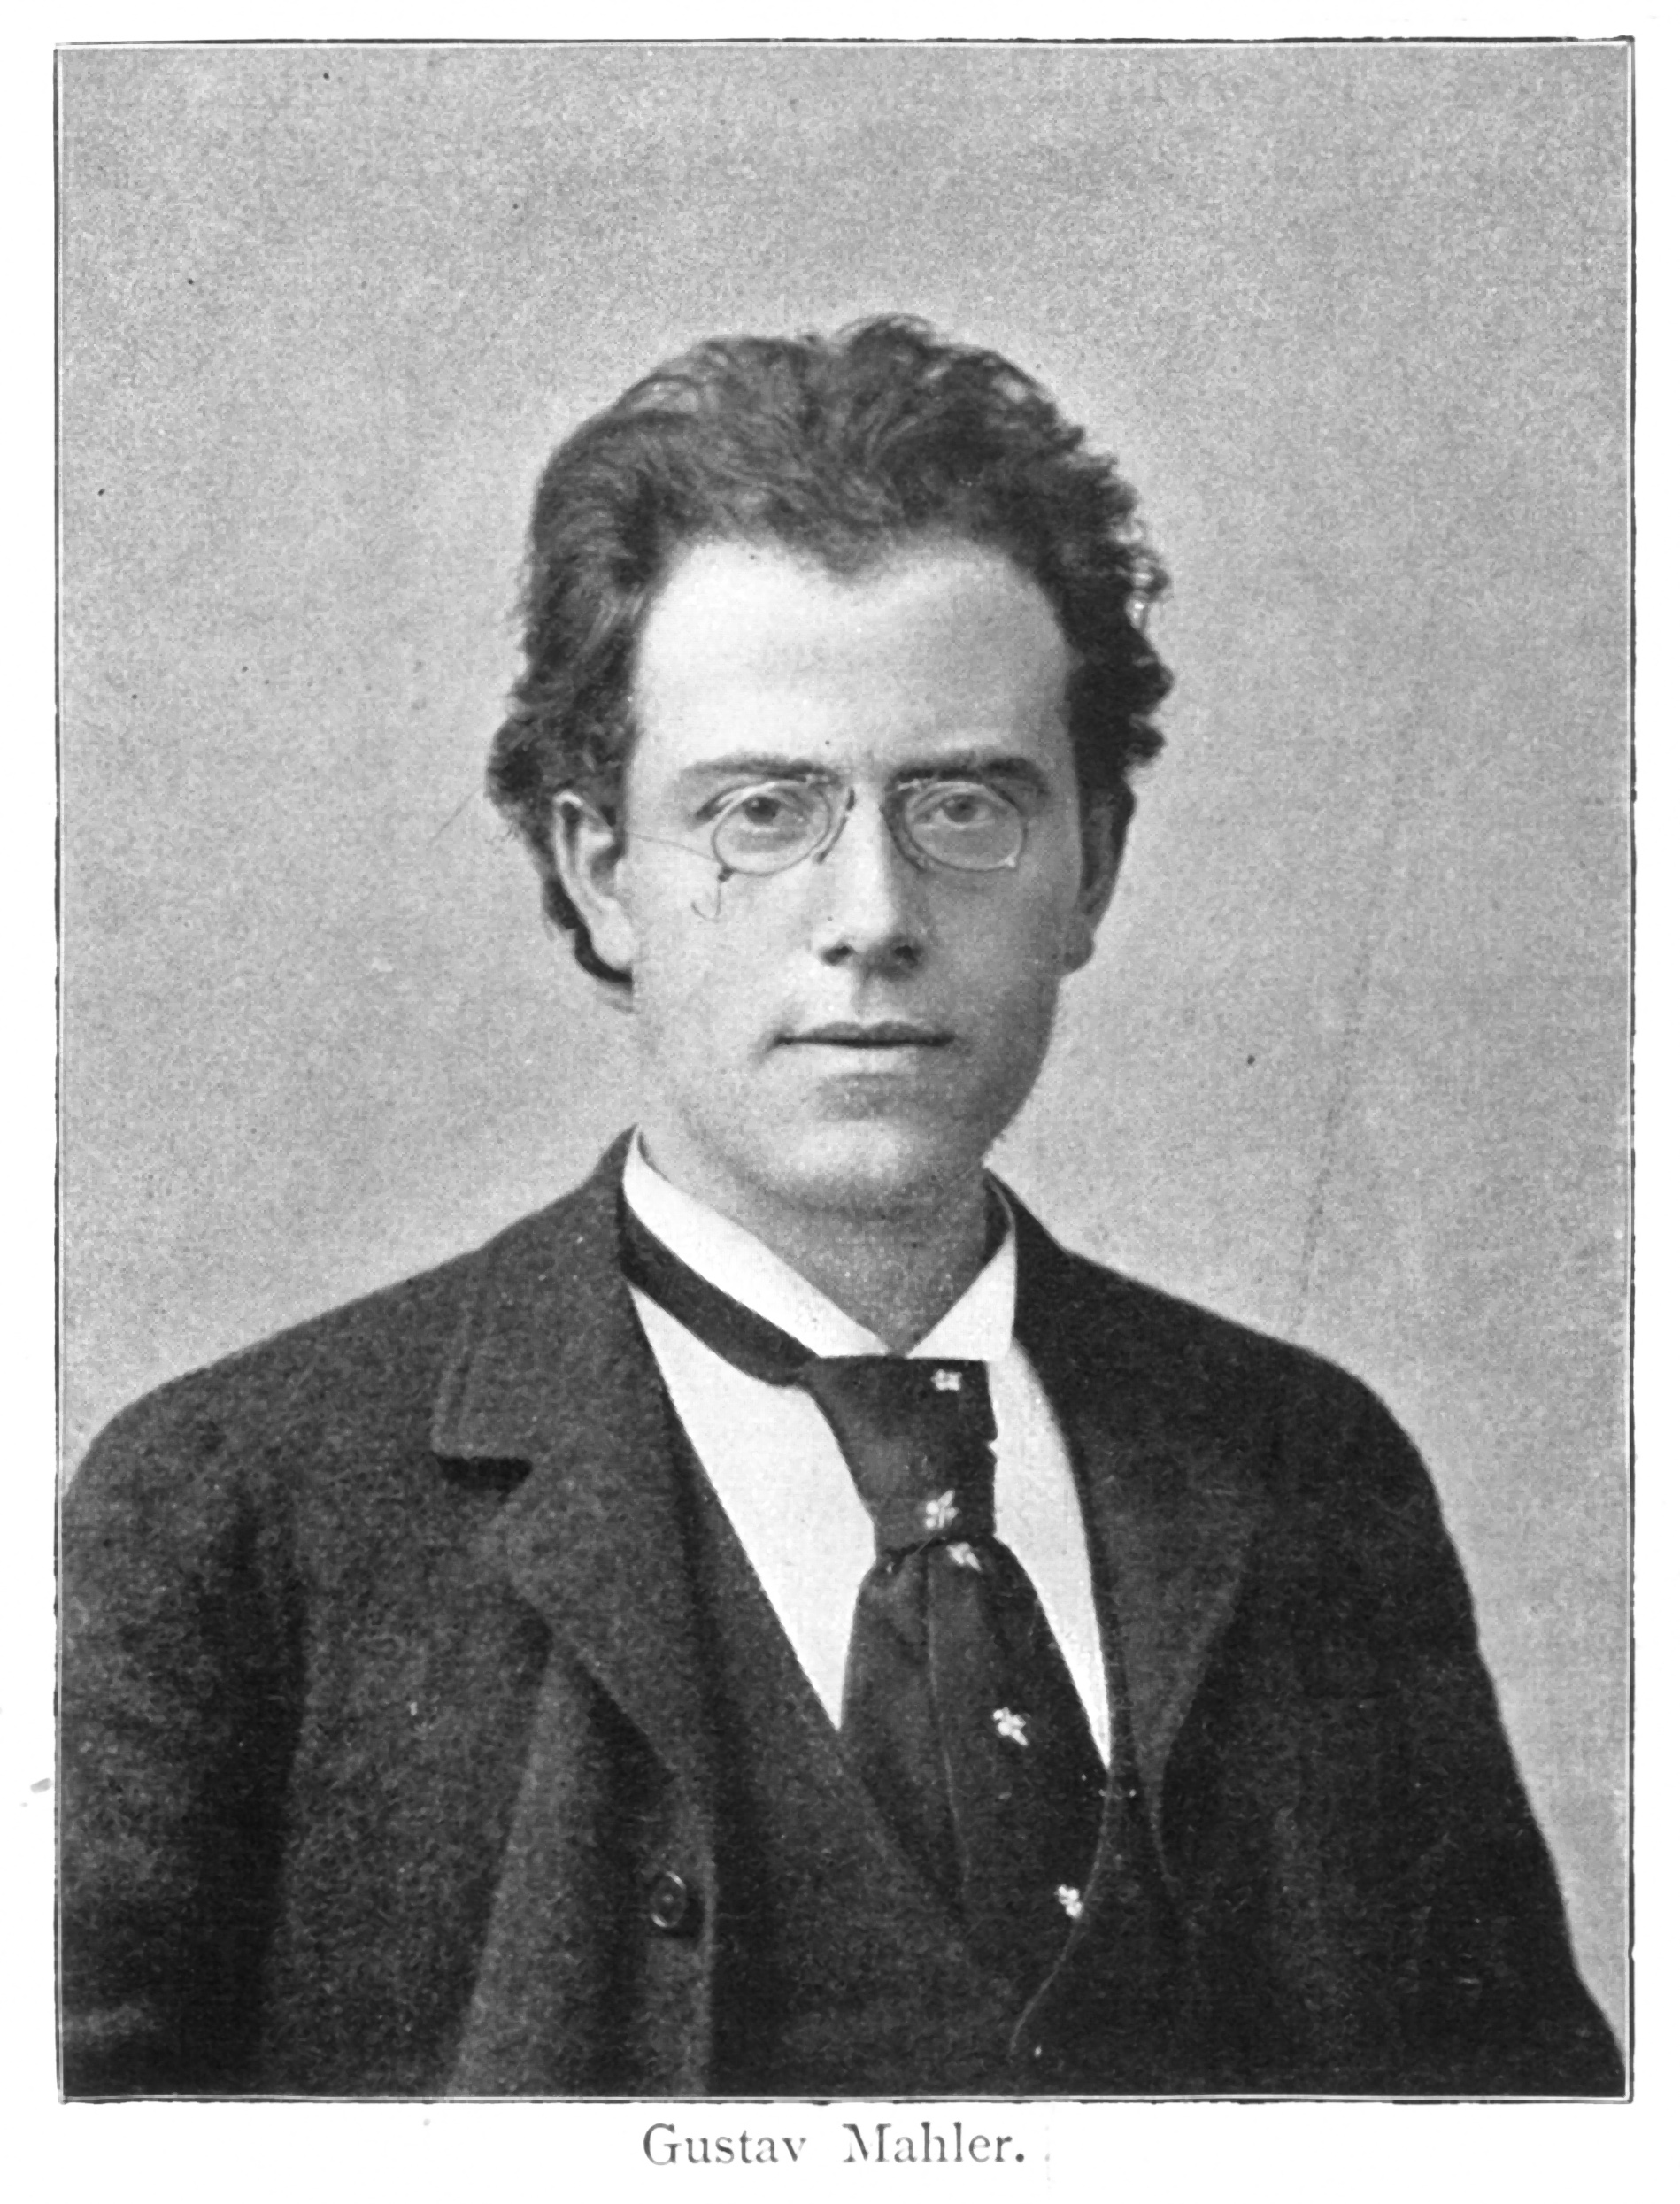 Mahler Group 4